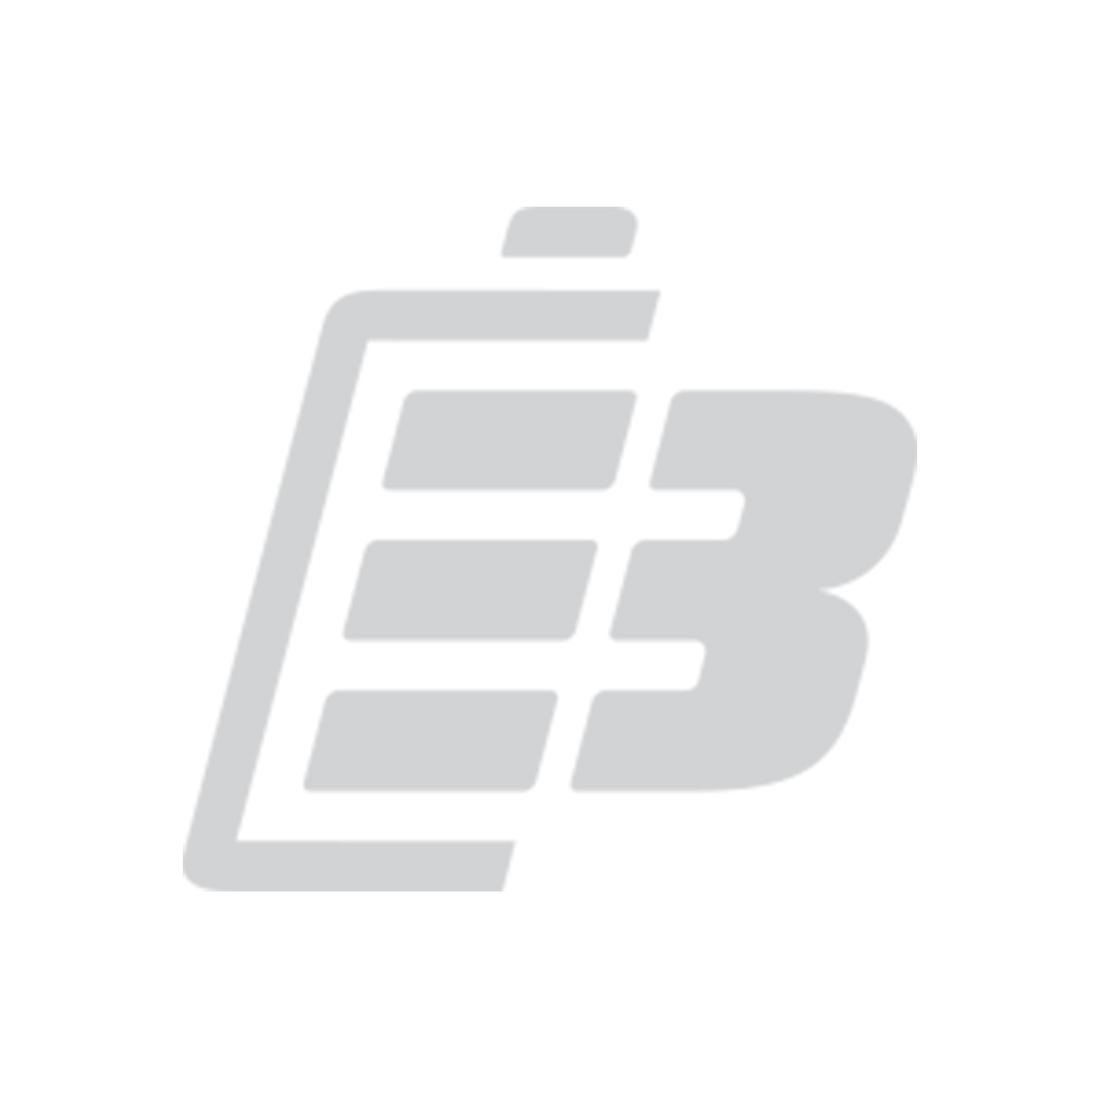 Choetech SC009 100W Foldable Solar Charger